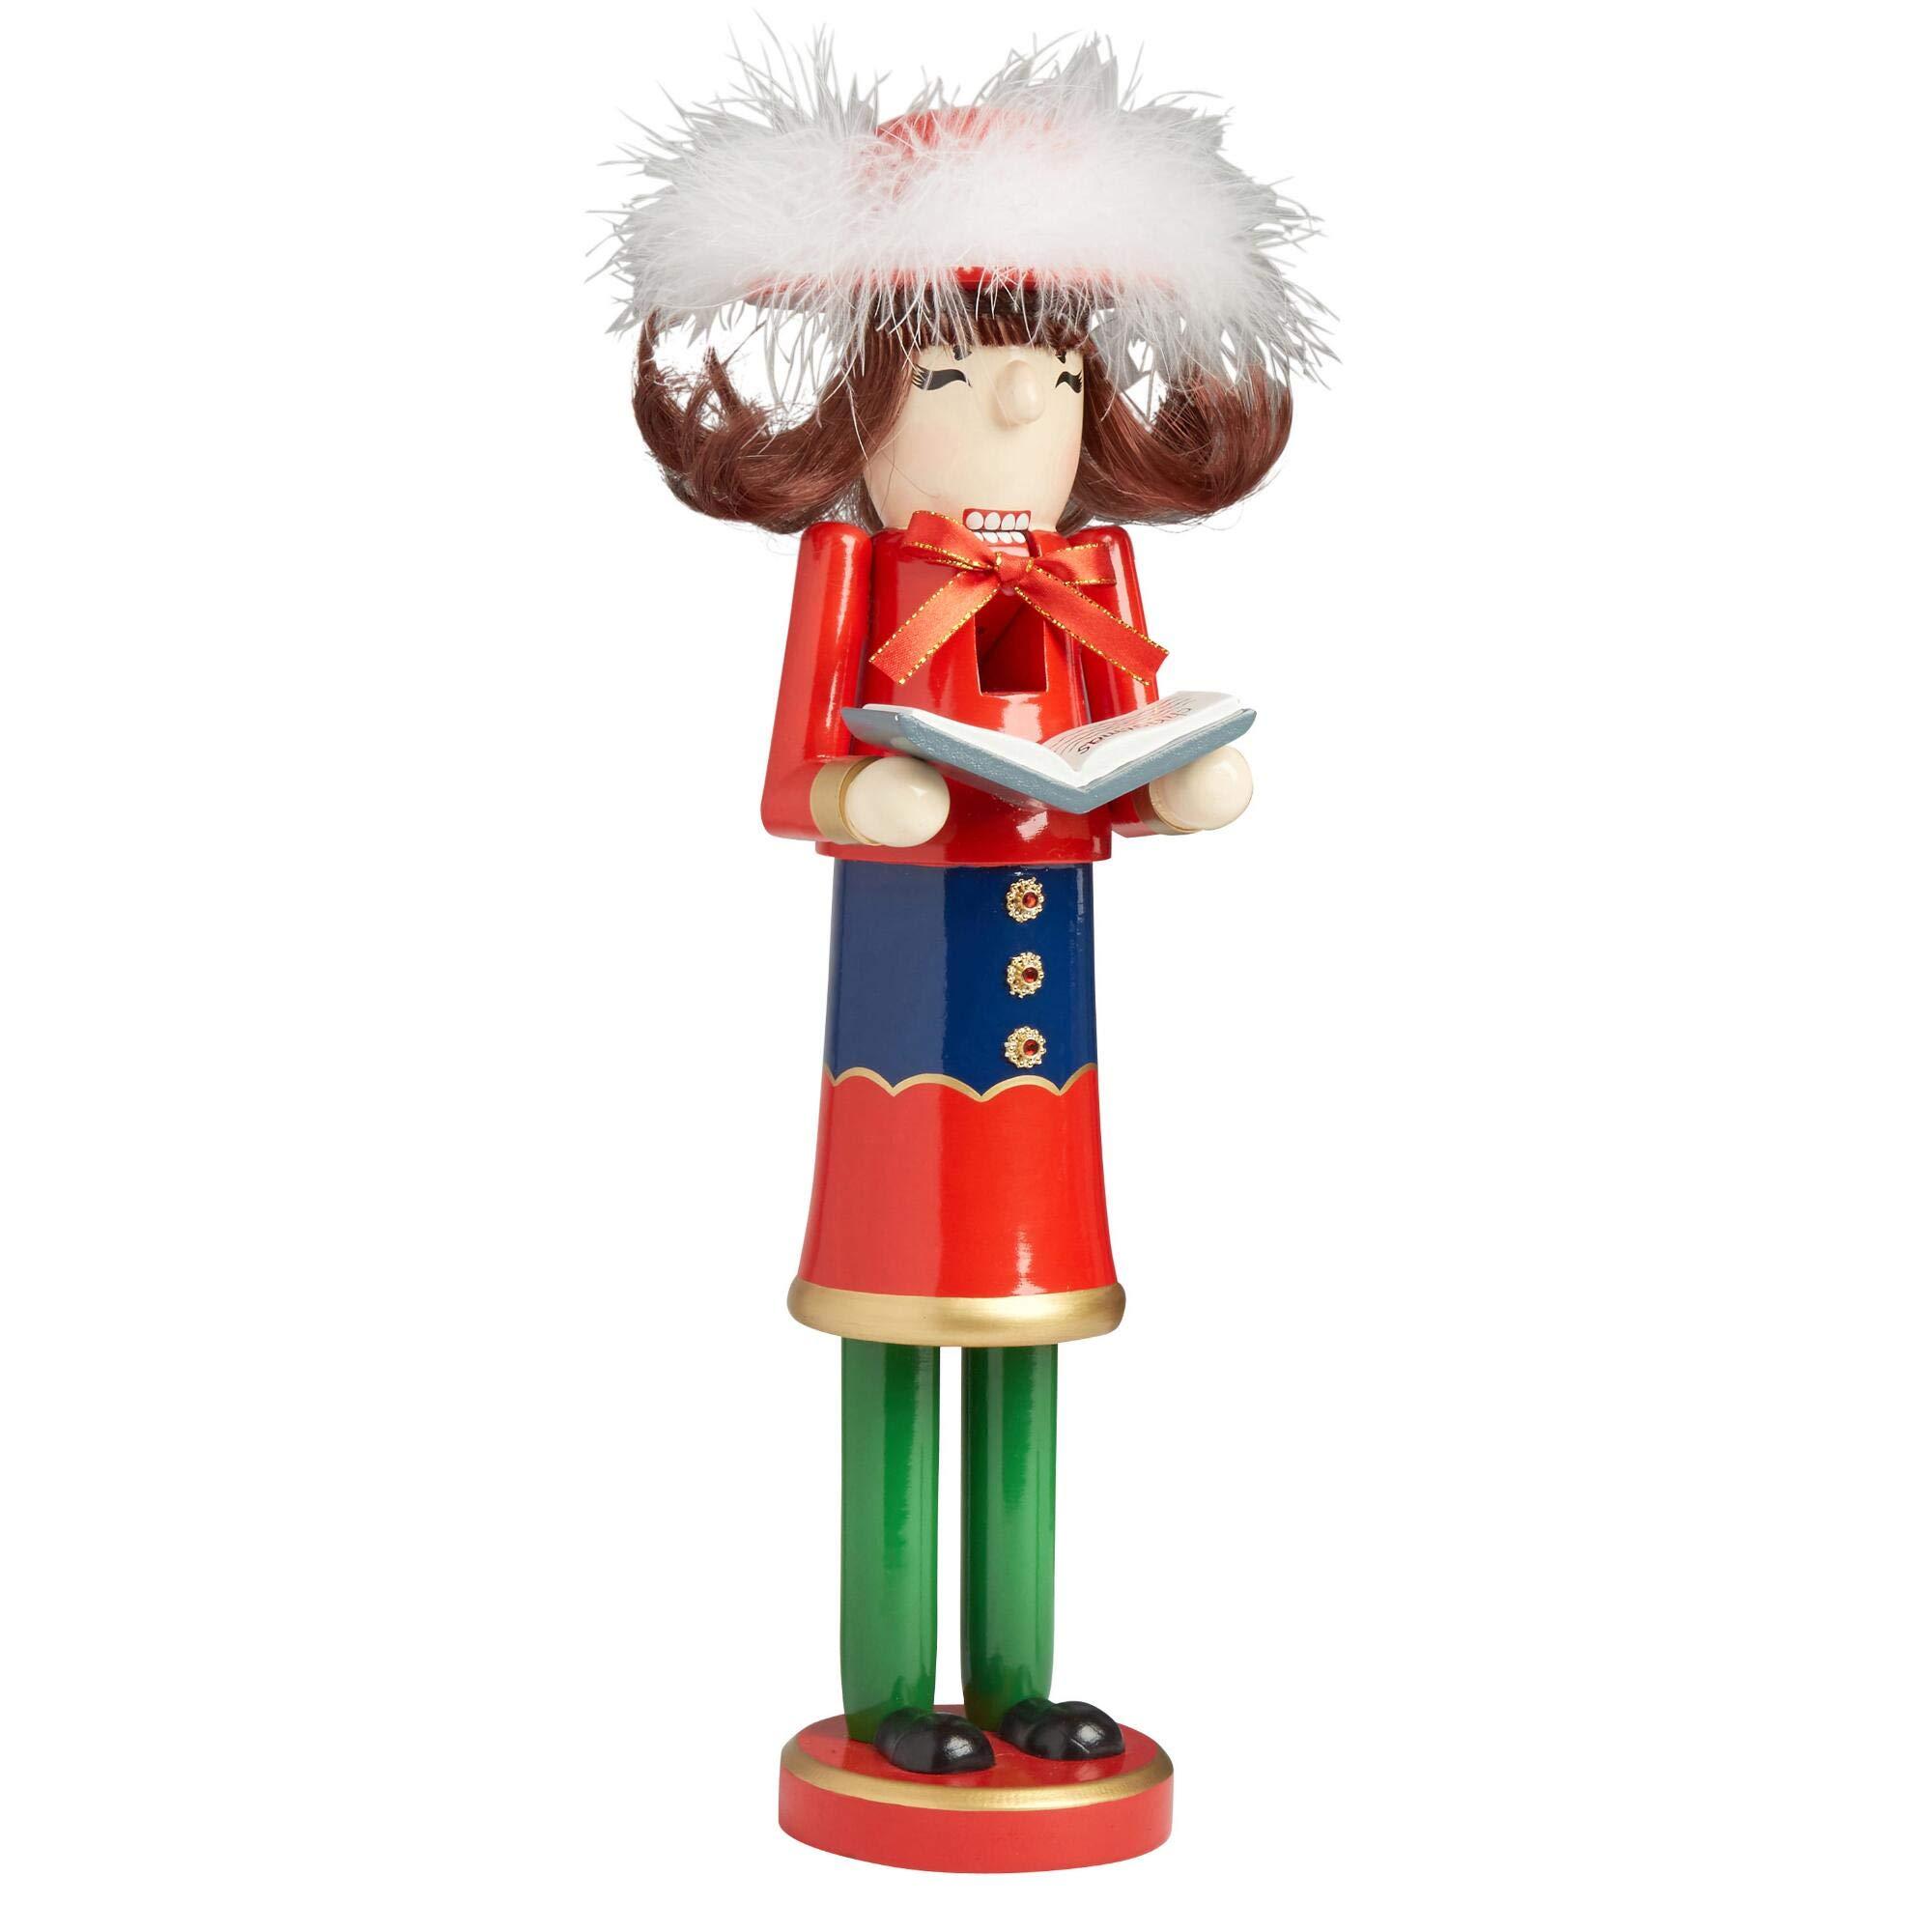 Northeast Home Goods Wooden Christmas Nutcracker Decor, 15-inch Girl Caroler with Book